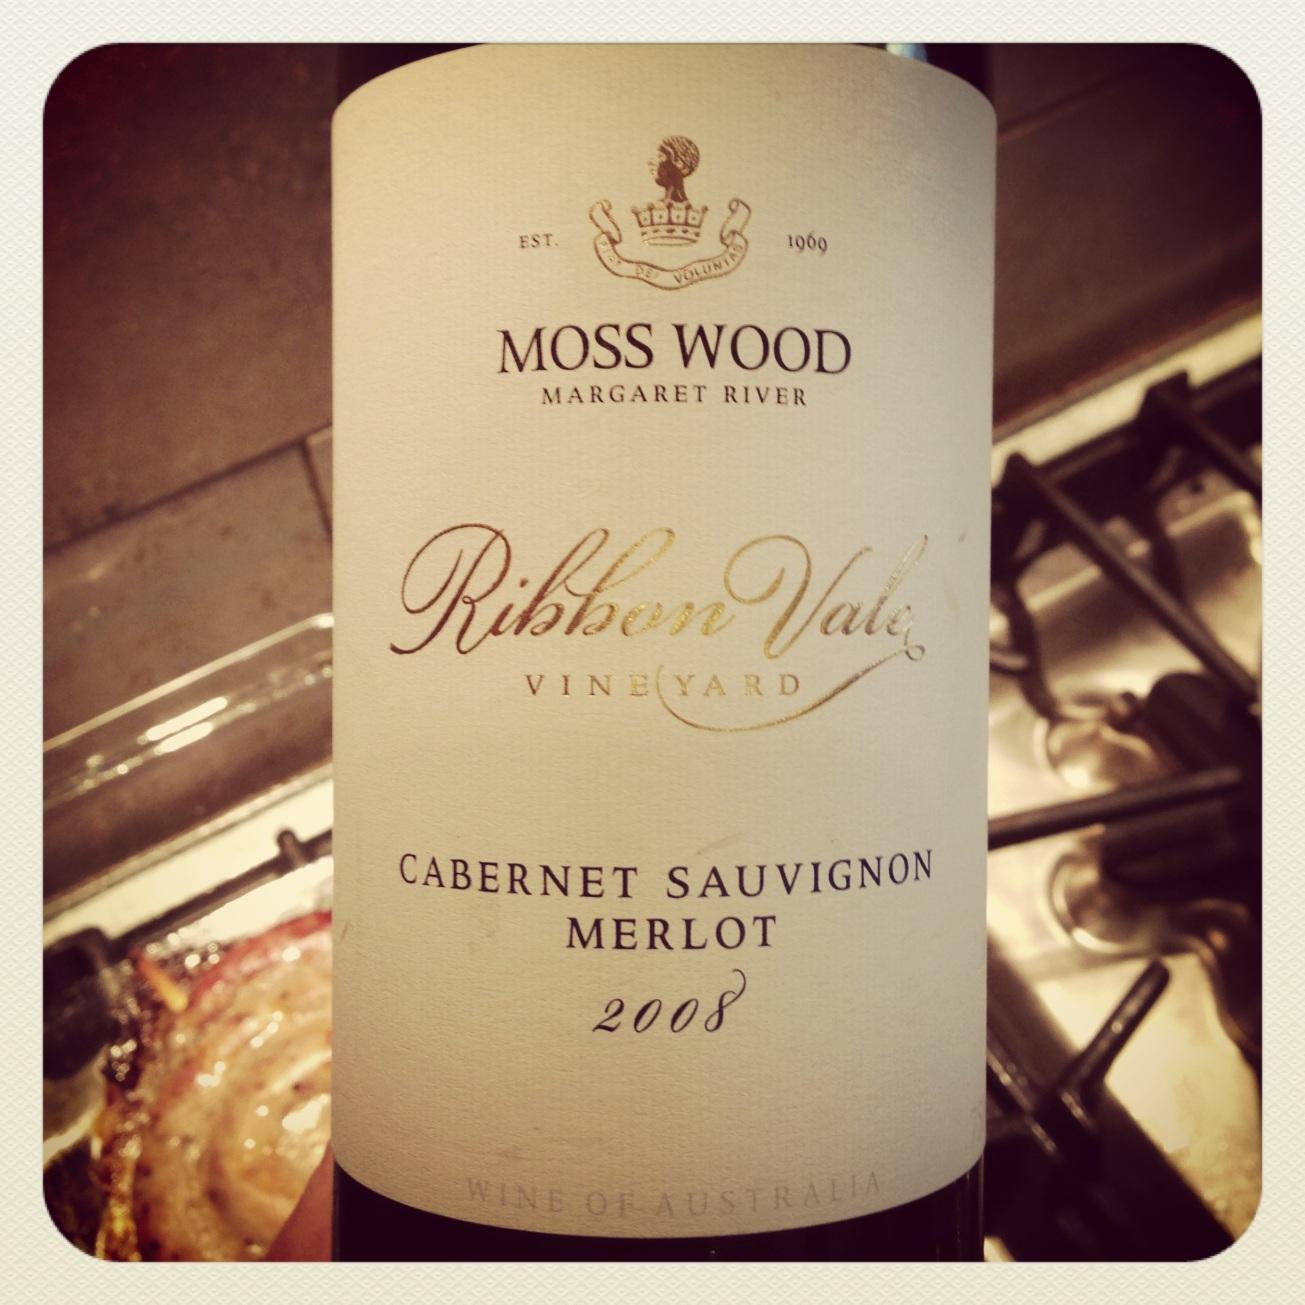 2008 Moss Wood Cabernet-Merlot Ribbon Vale